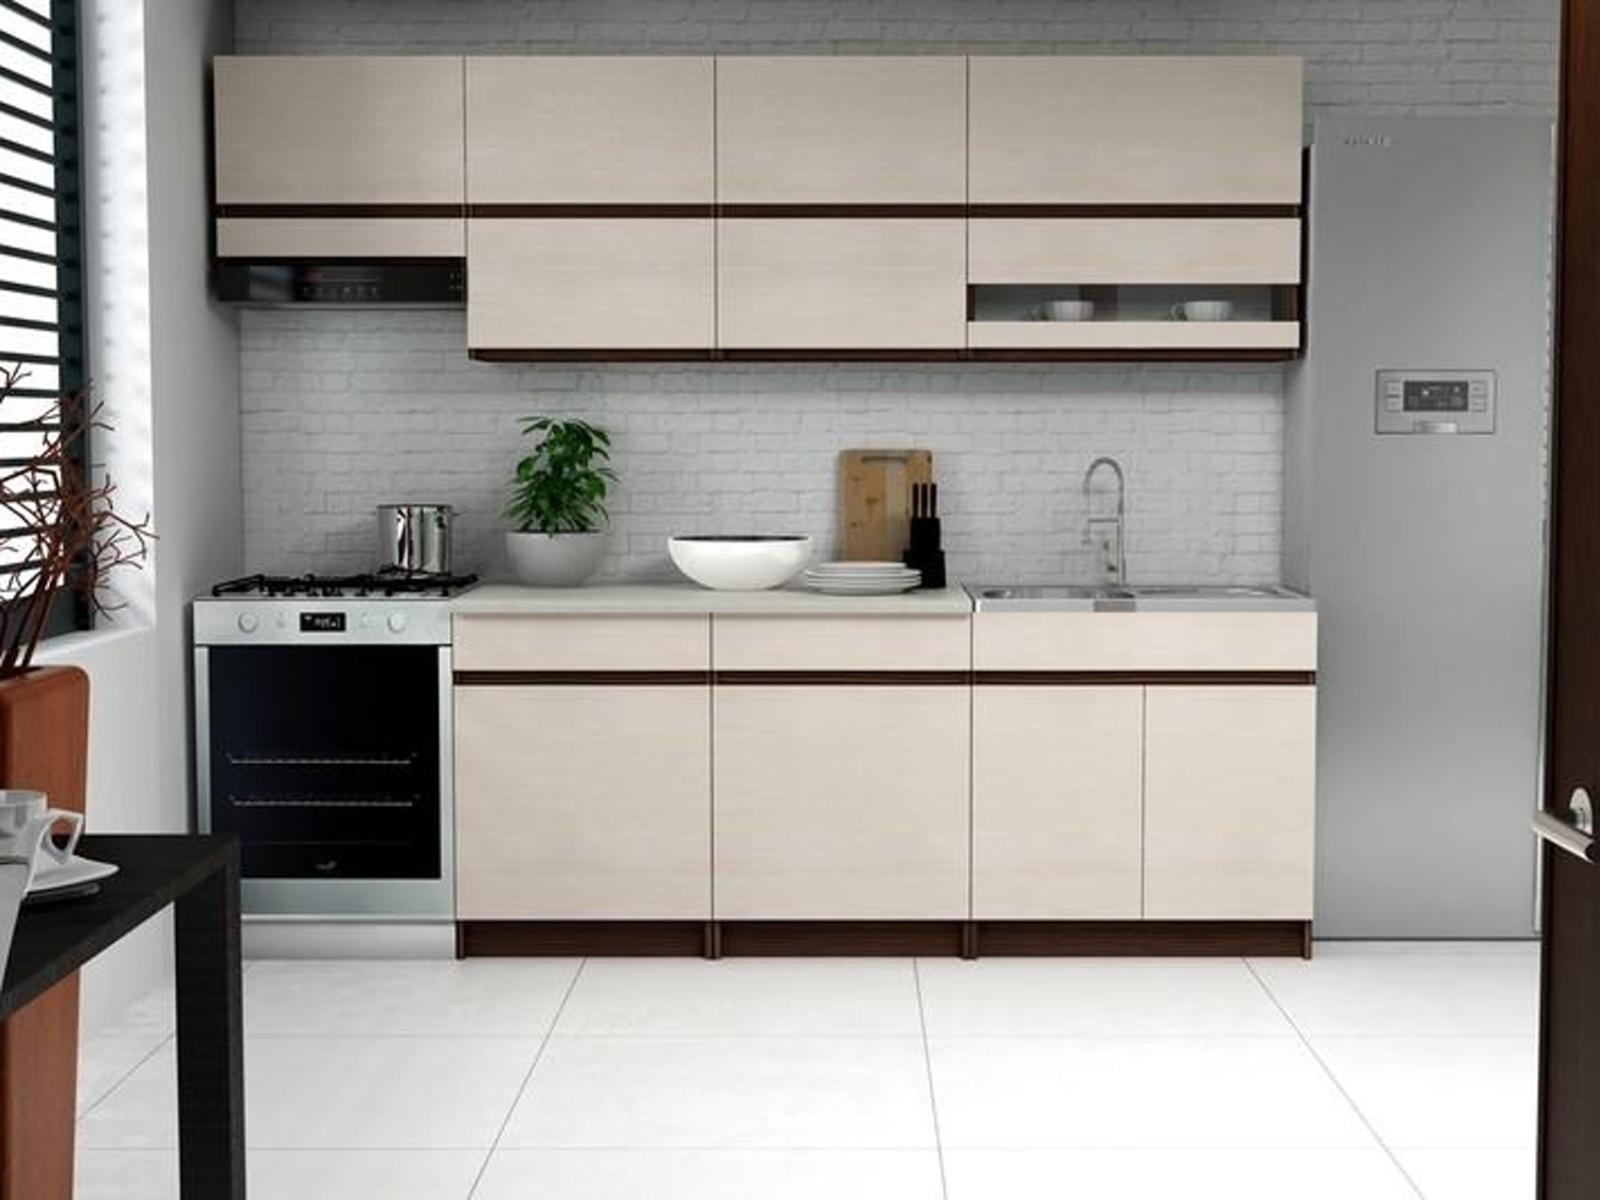 Halmar Kuchyně ELIZA I, 200/260 cm, jasan Verona světlý/jasan Verona tmavý